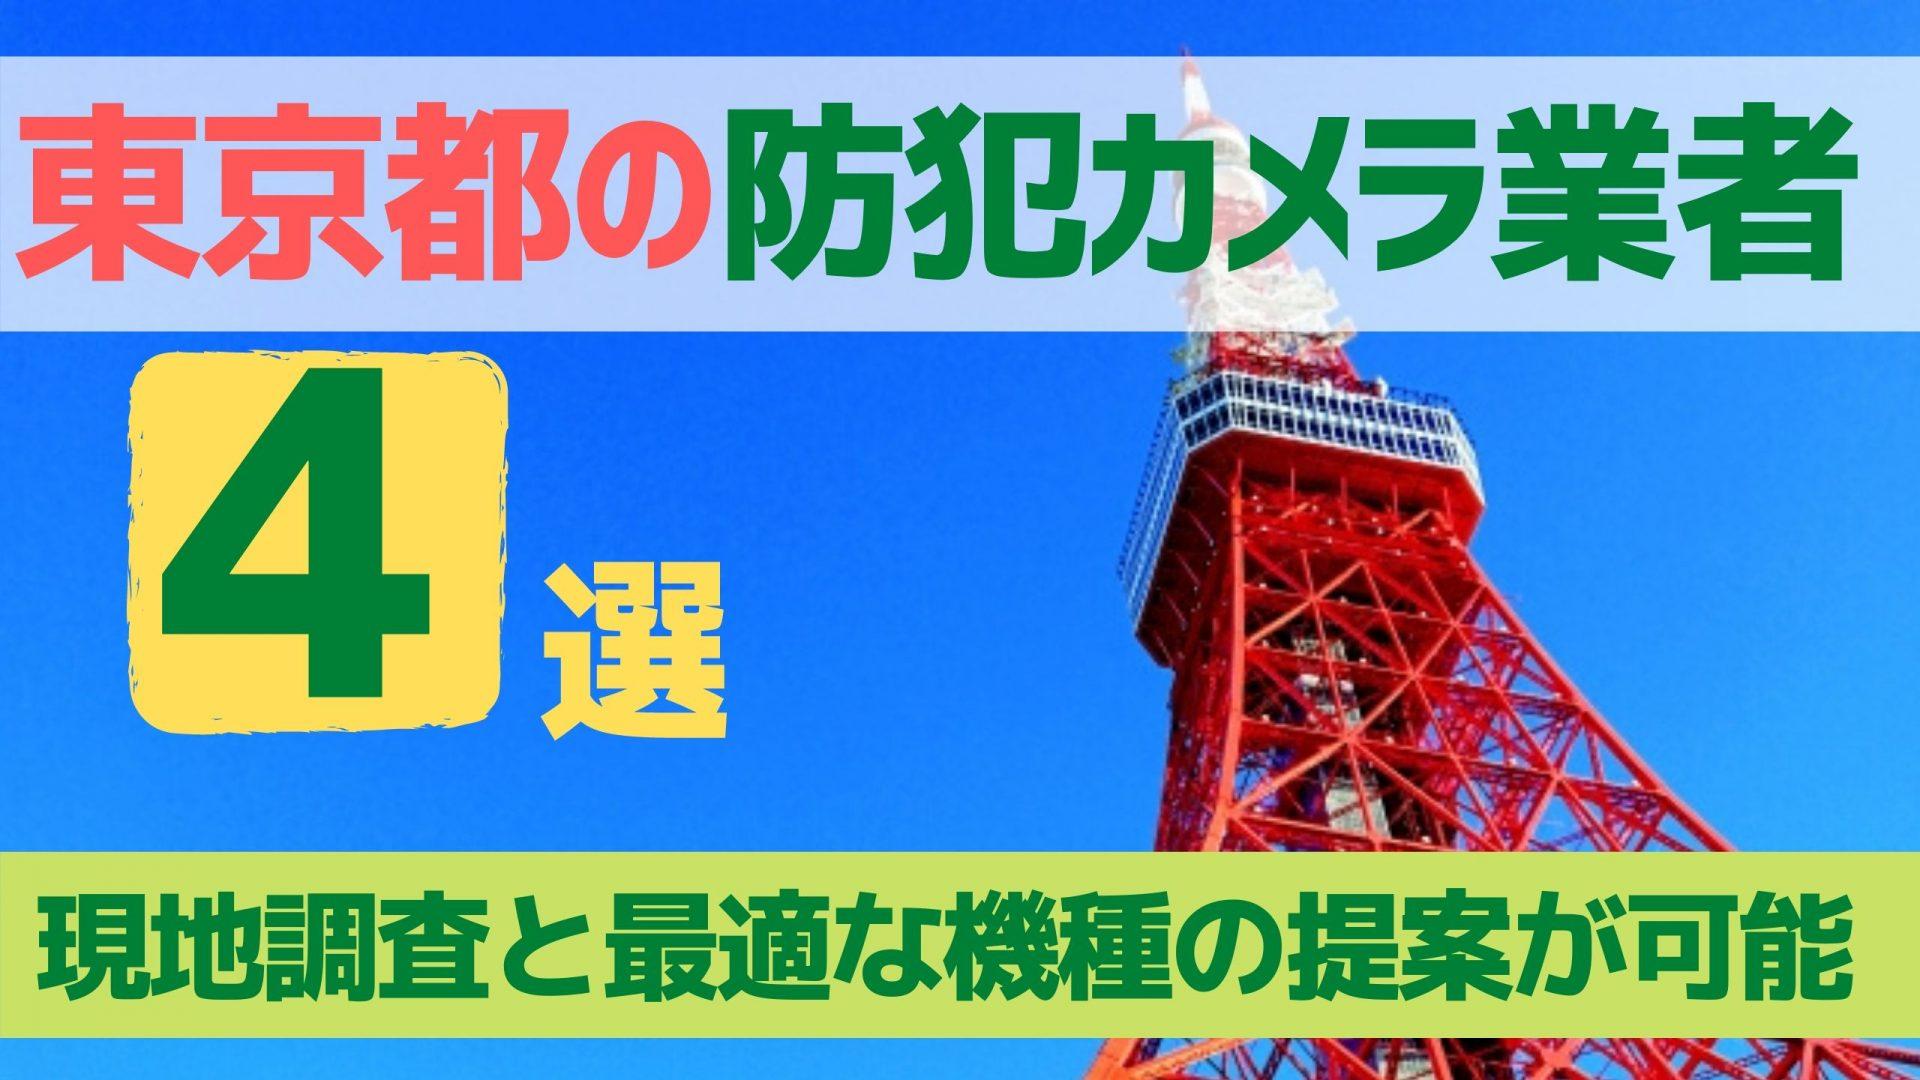 4fc2365d16a781b0b45fd4fb92695684 - 東京都で現場調査と最適な機器の提案ができる防犯カメラ業者4選!